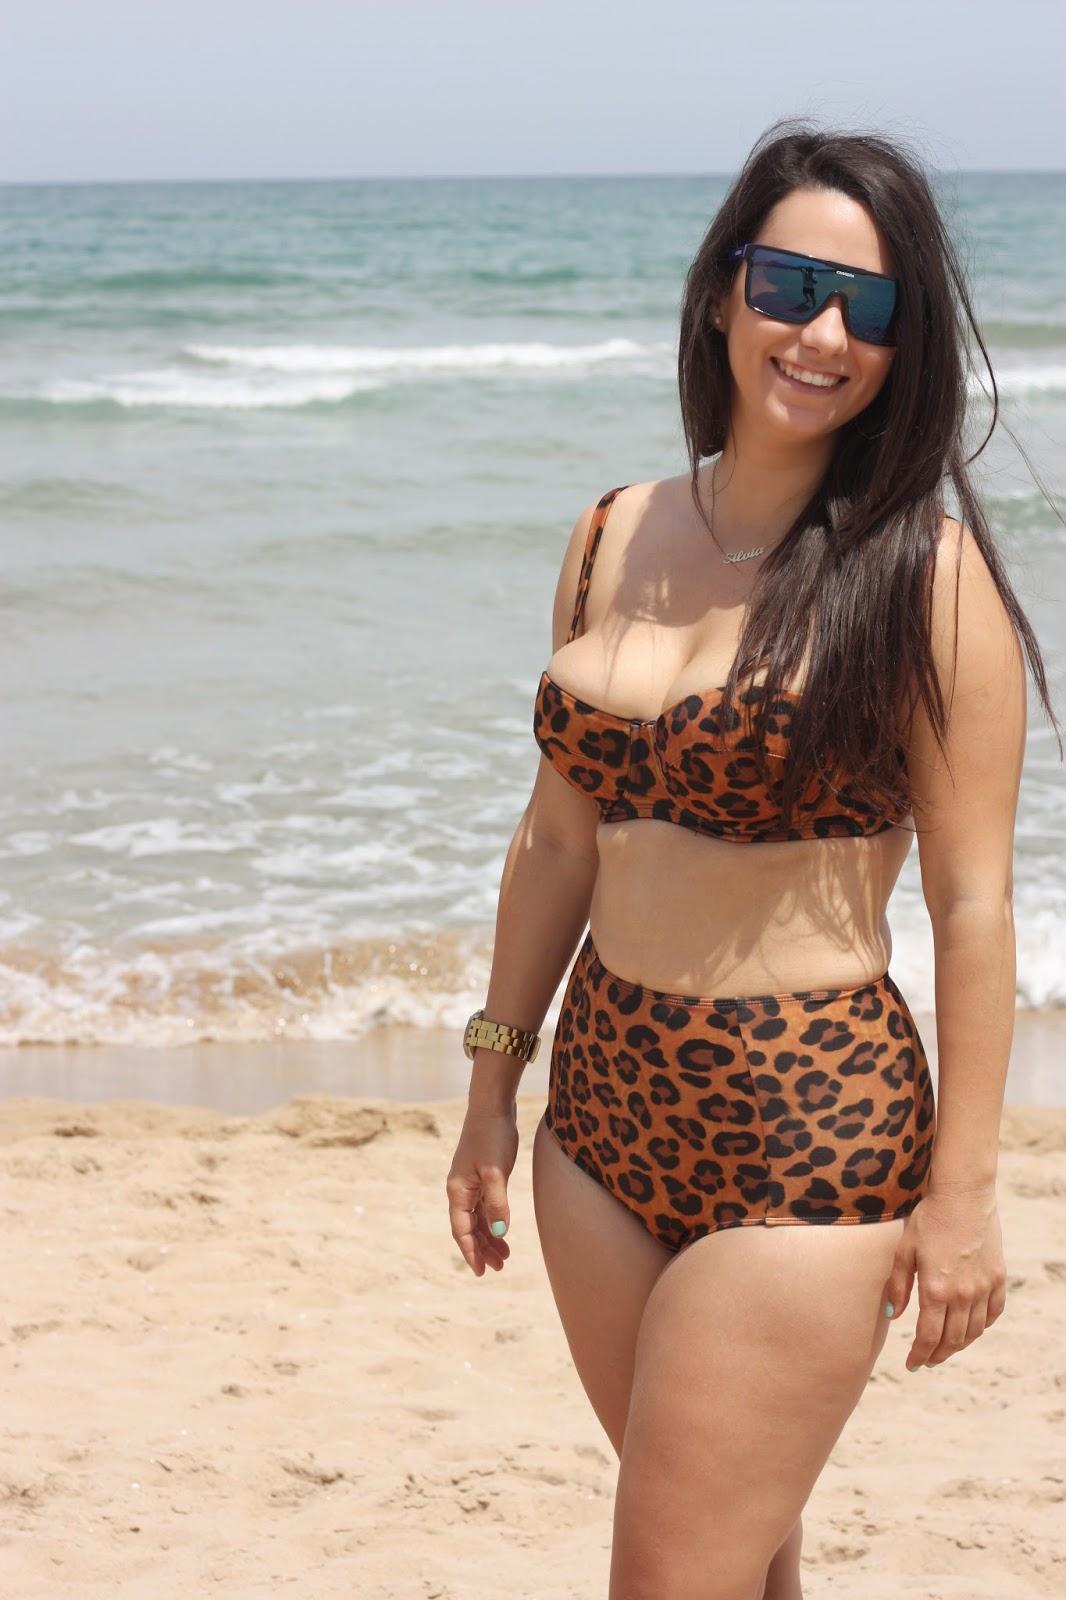 http://silviparalasamigas.blogspot.com.es/2014/05/bikini-vintage-leopardo.html